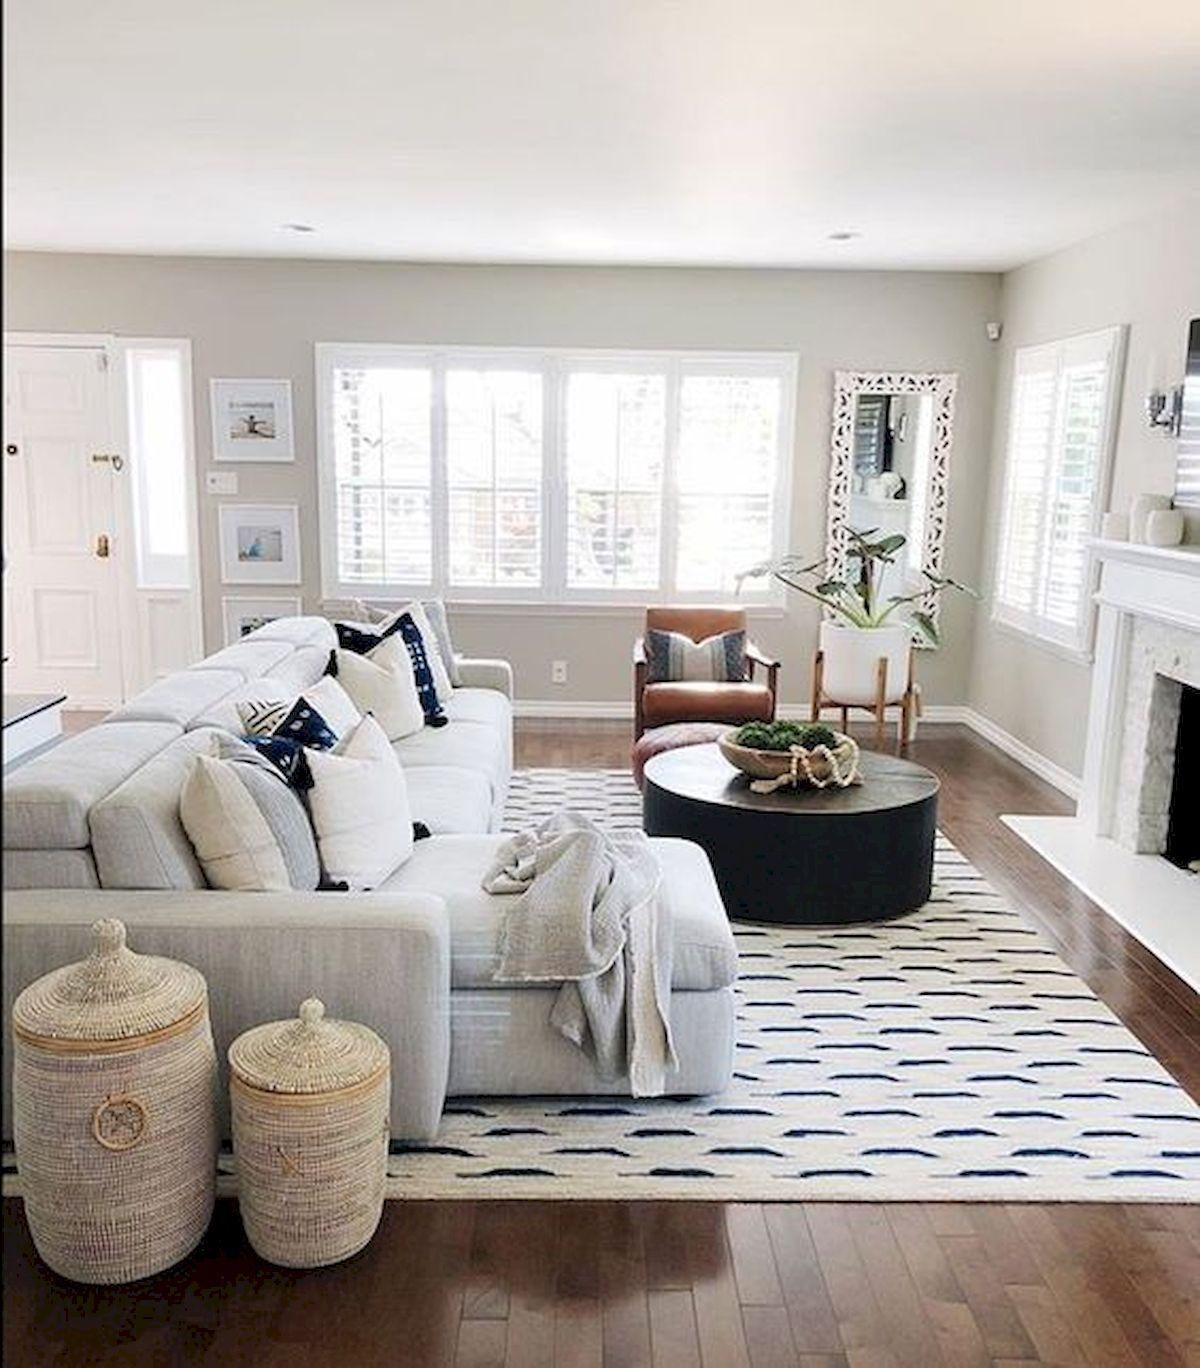 White living room dog kids ikea the everymom at home decor also rh pinterest